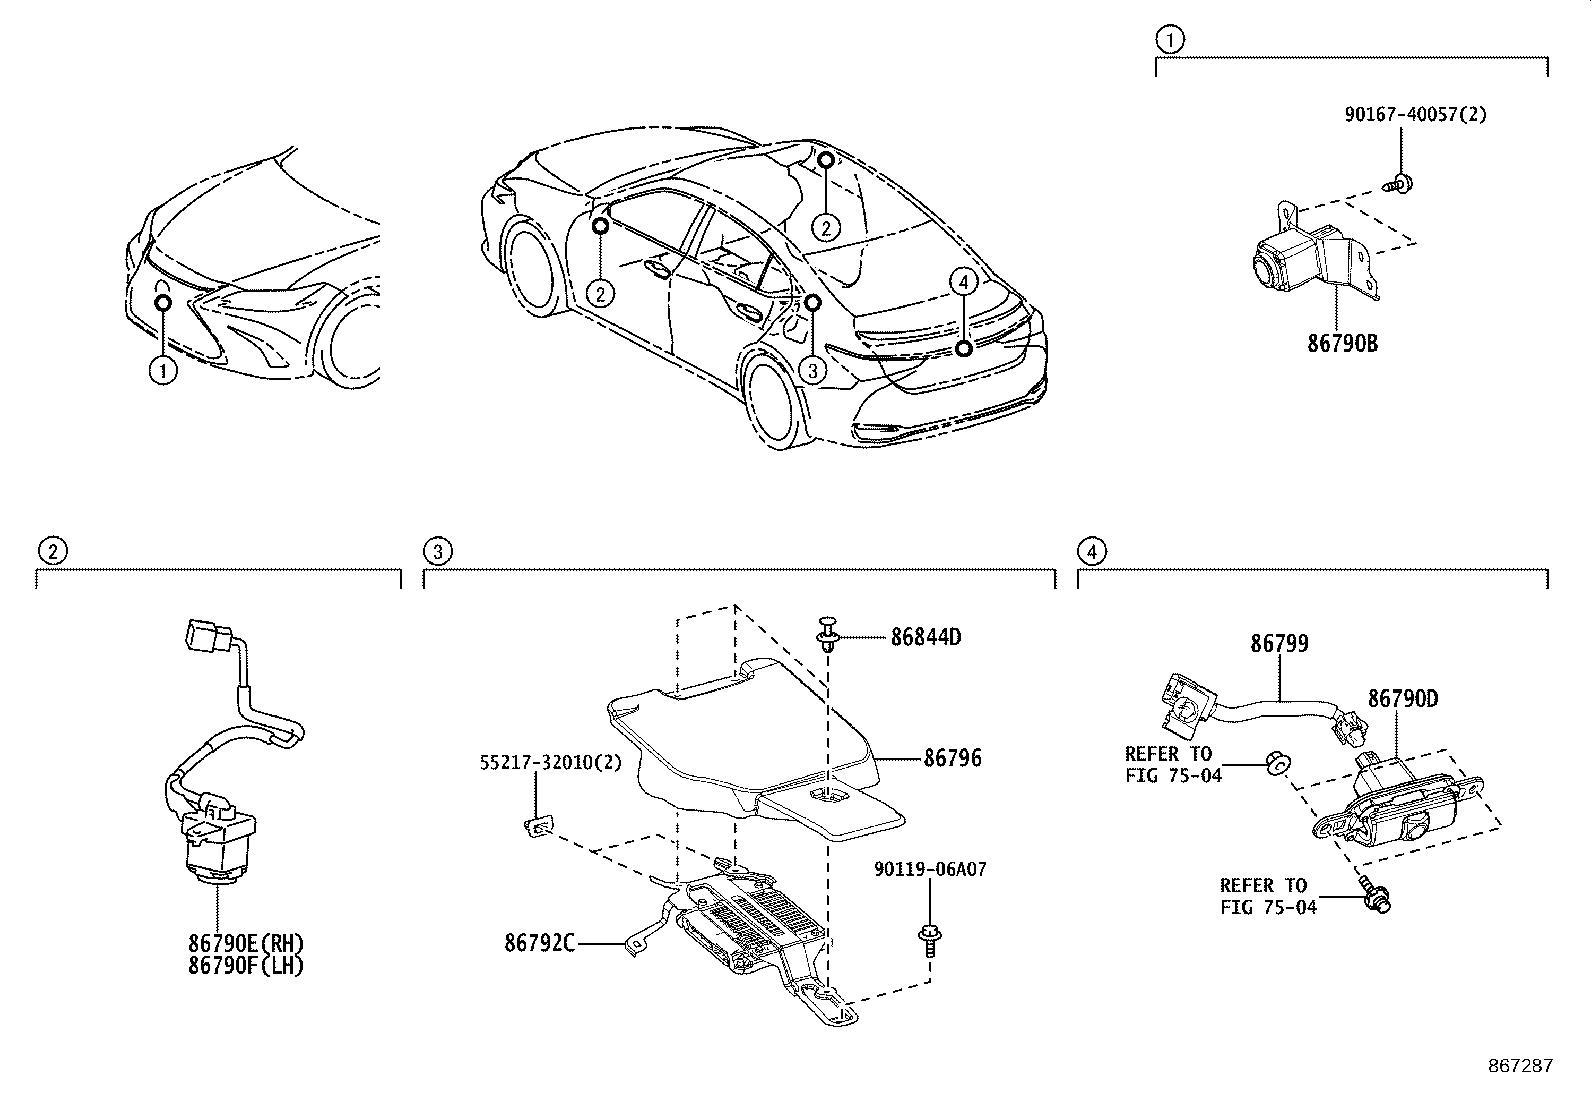 Lexus ES 350 Wire, television camera. Monitor, back